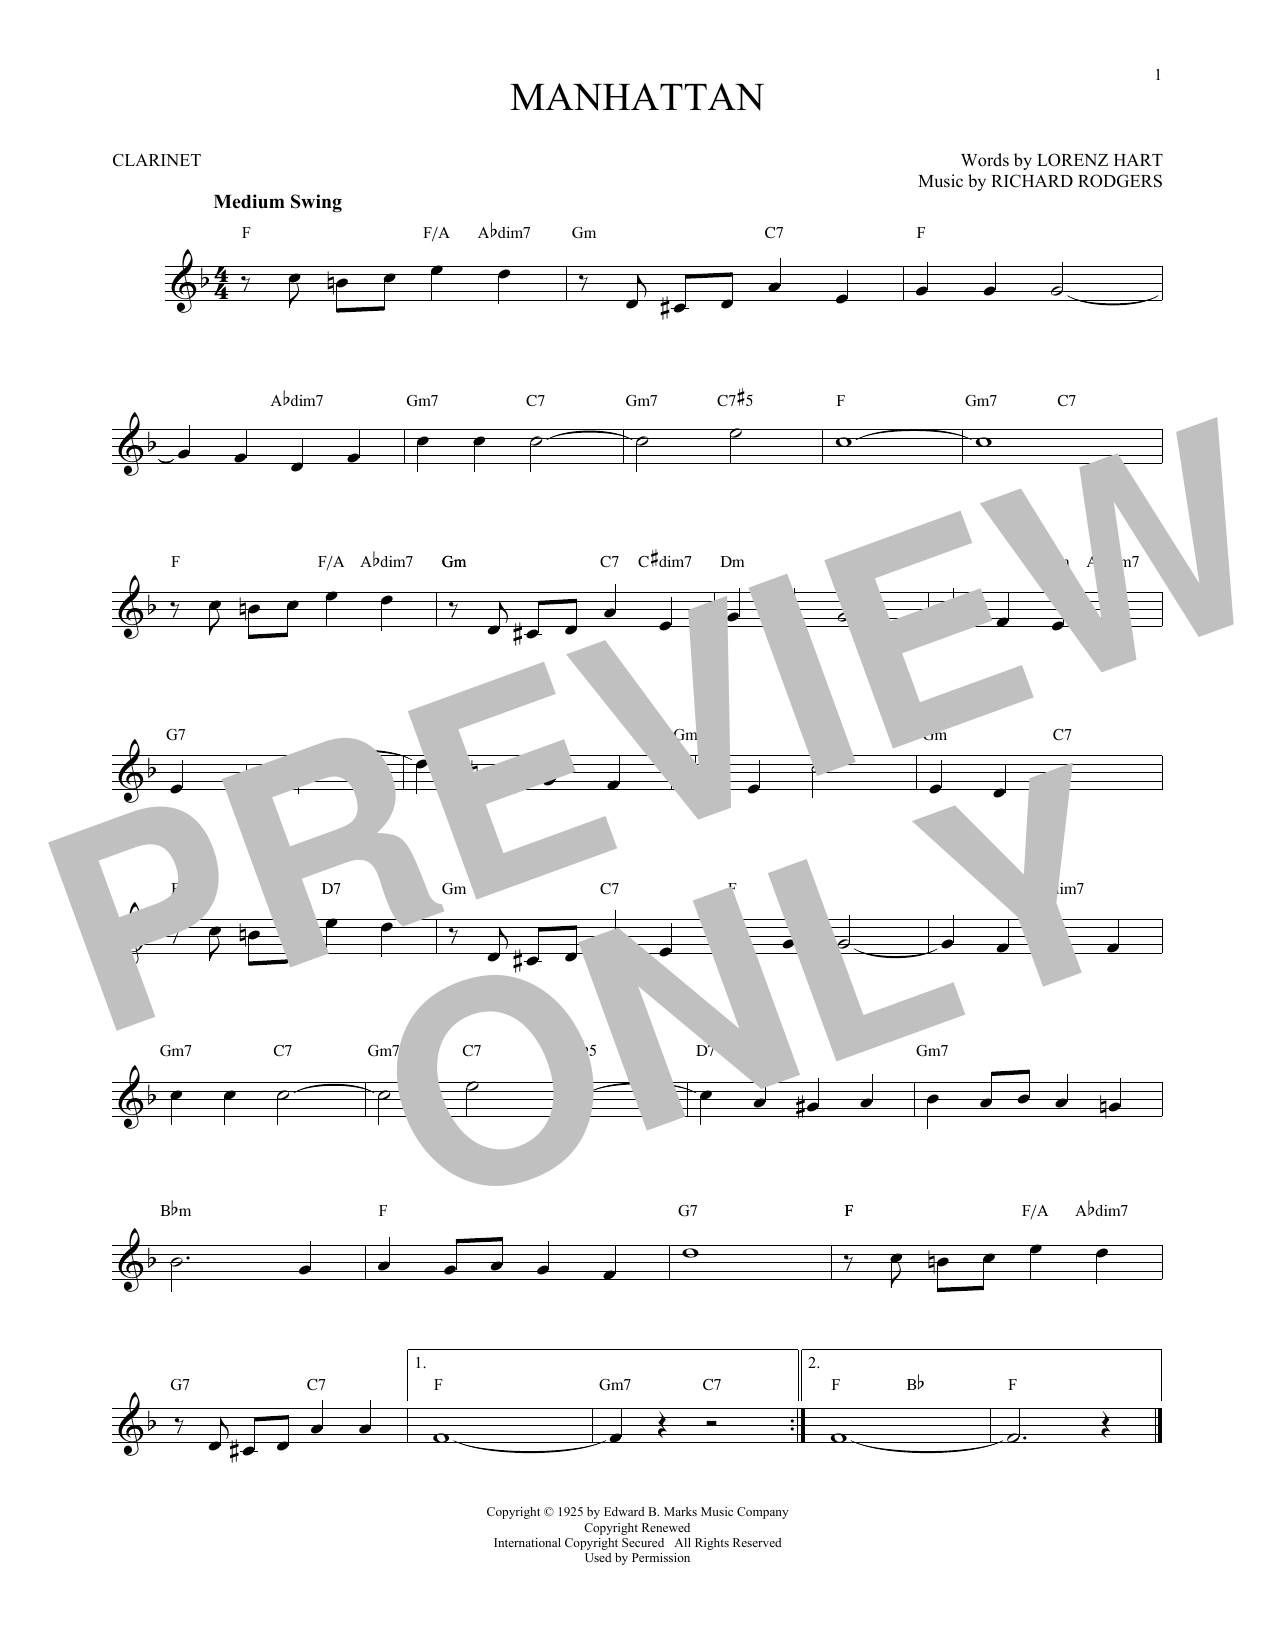 Partition clarinette Manhattan de Rodgers & Hart - Clarinette